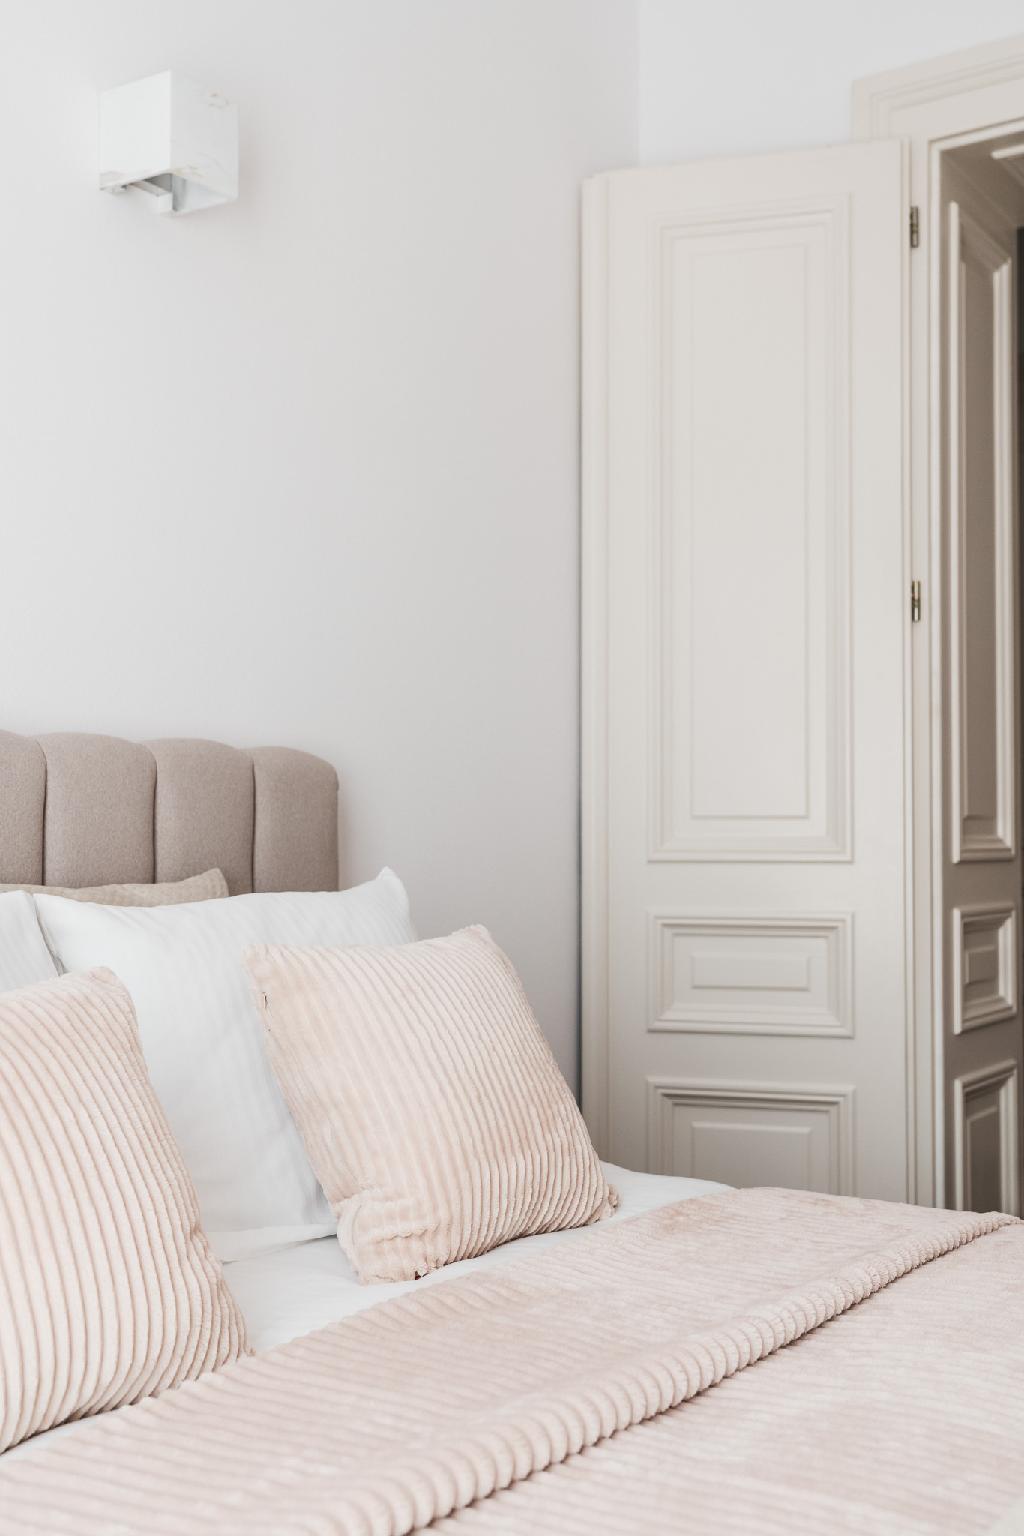 Elegant Cozy Apartment With Pieces Of Art HouseIII